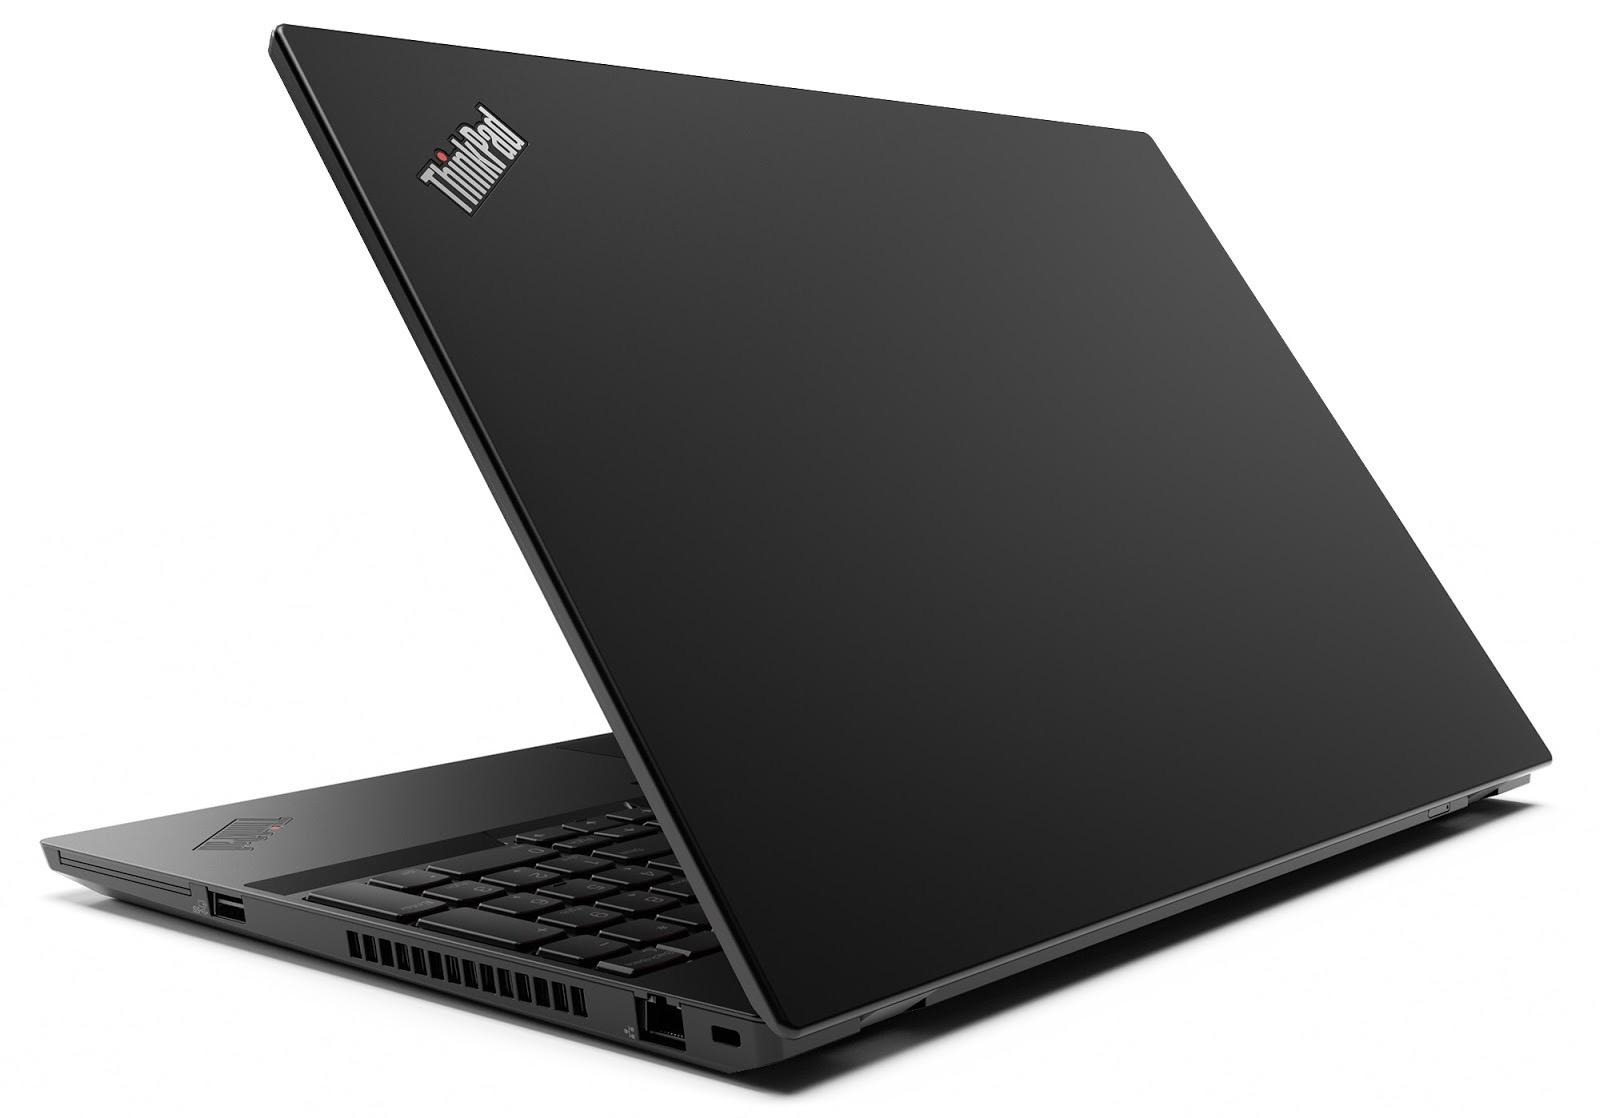 Фото 2. Ноутбук Lenovo ThinkPad T15 Gen 1 Black (20S60023RT)